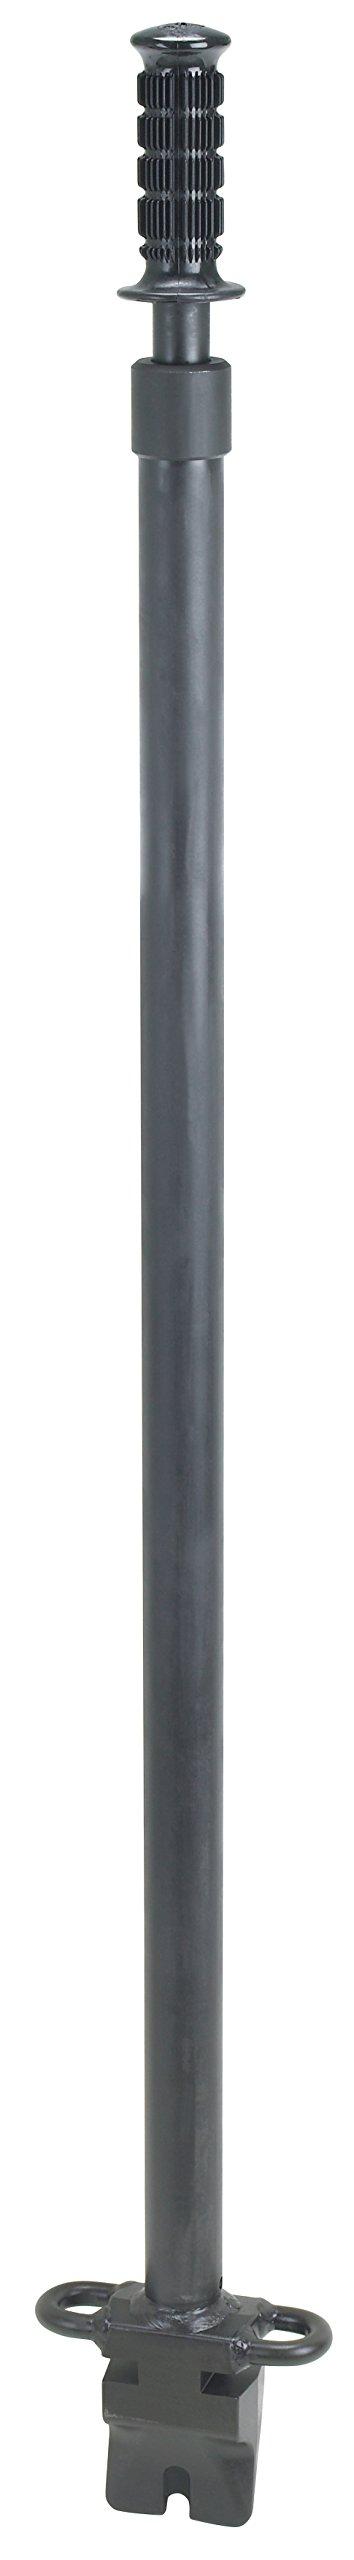 OTC Tools 5727 Sliding Bead Breaker by OTC